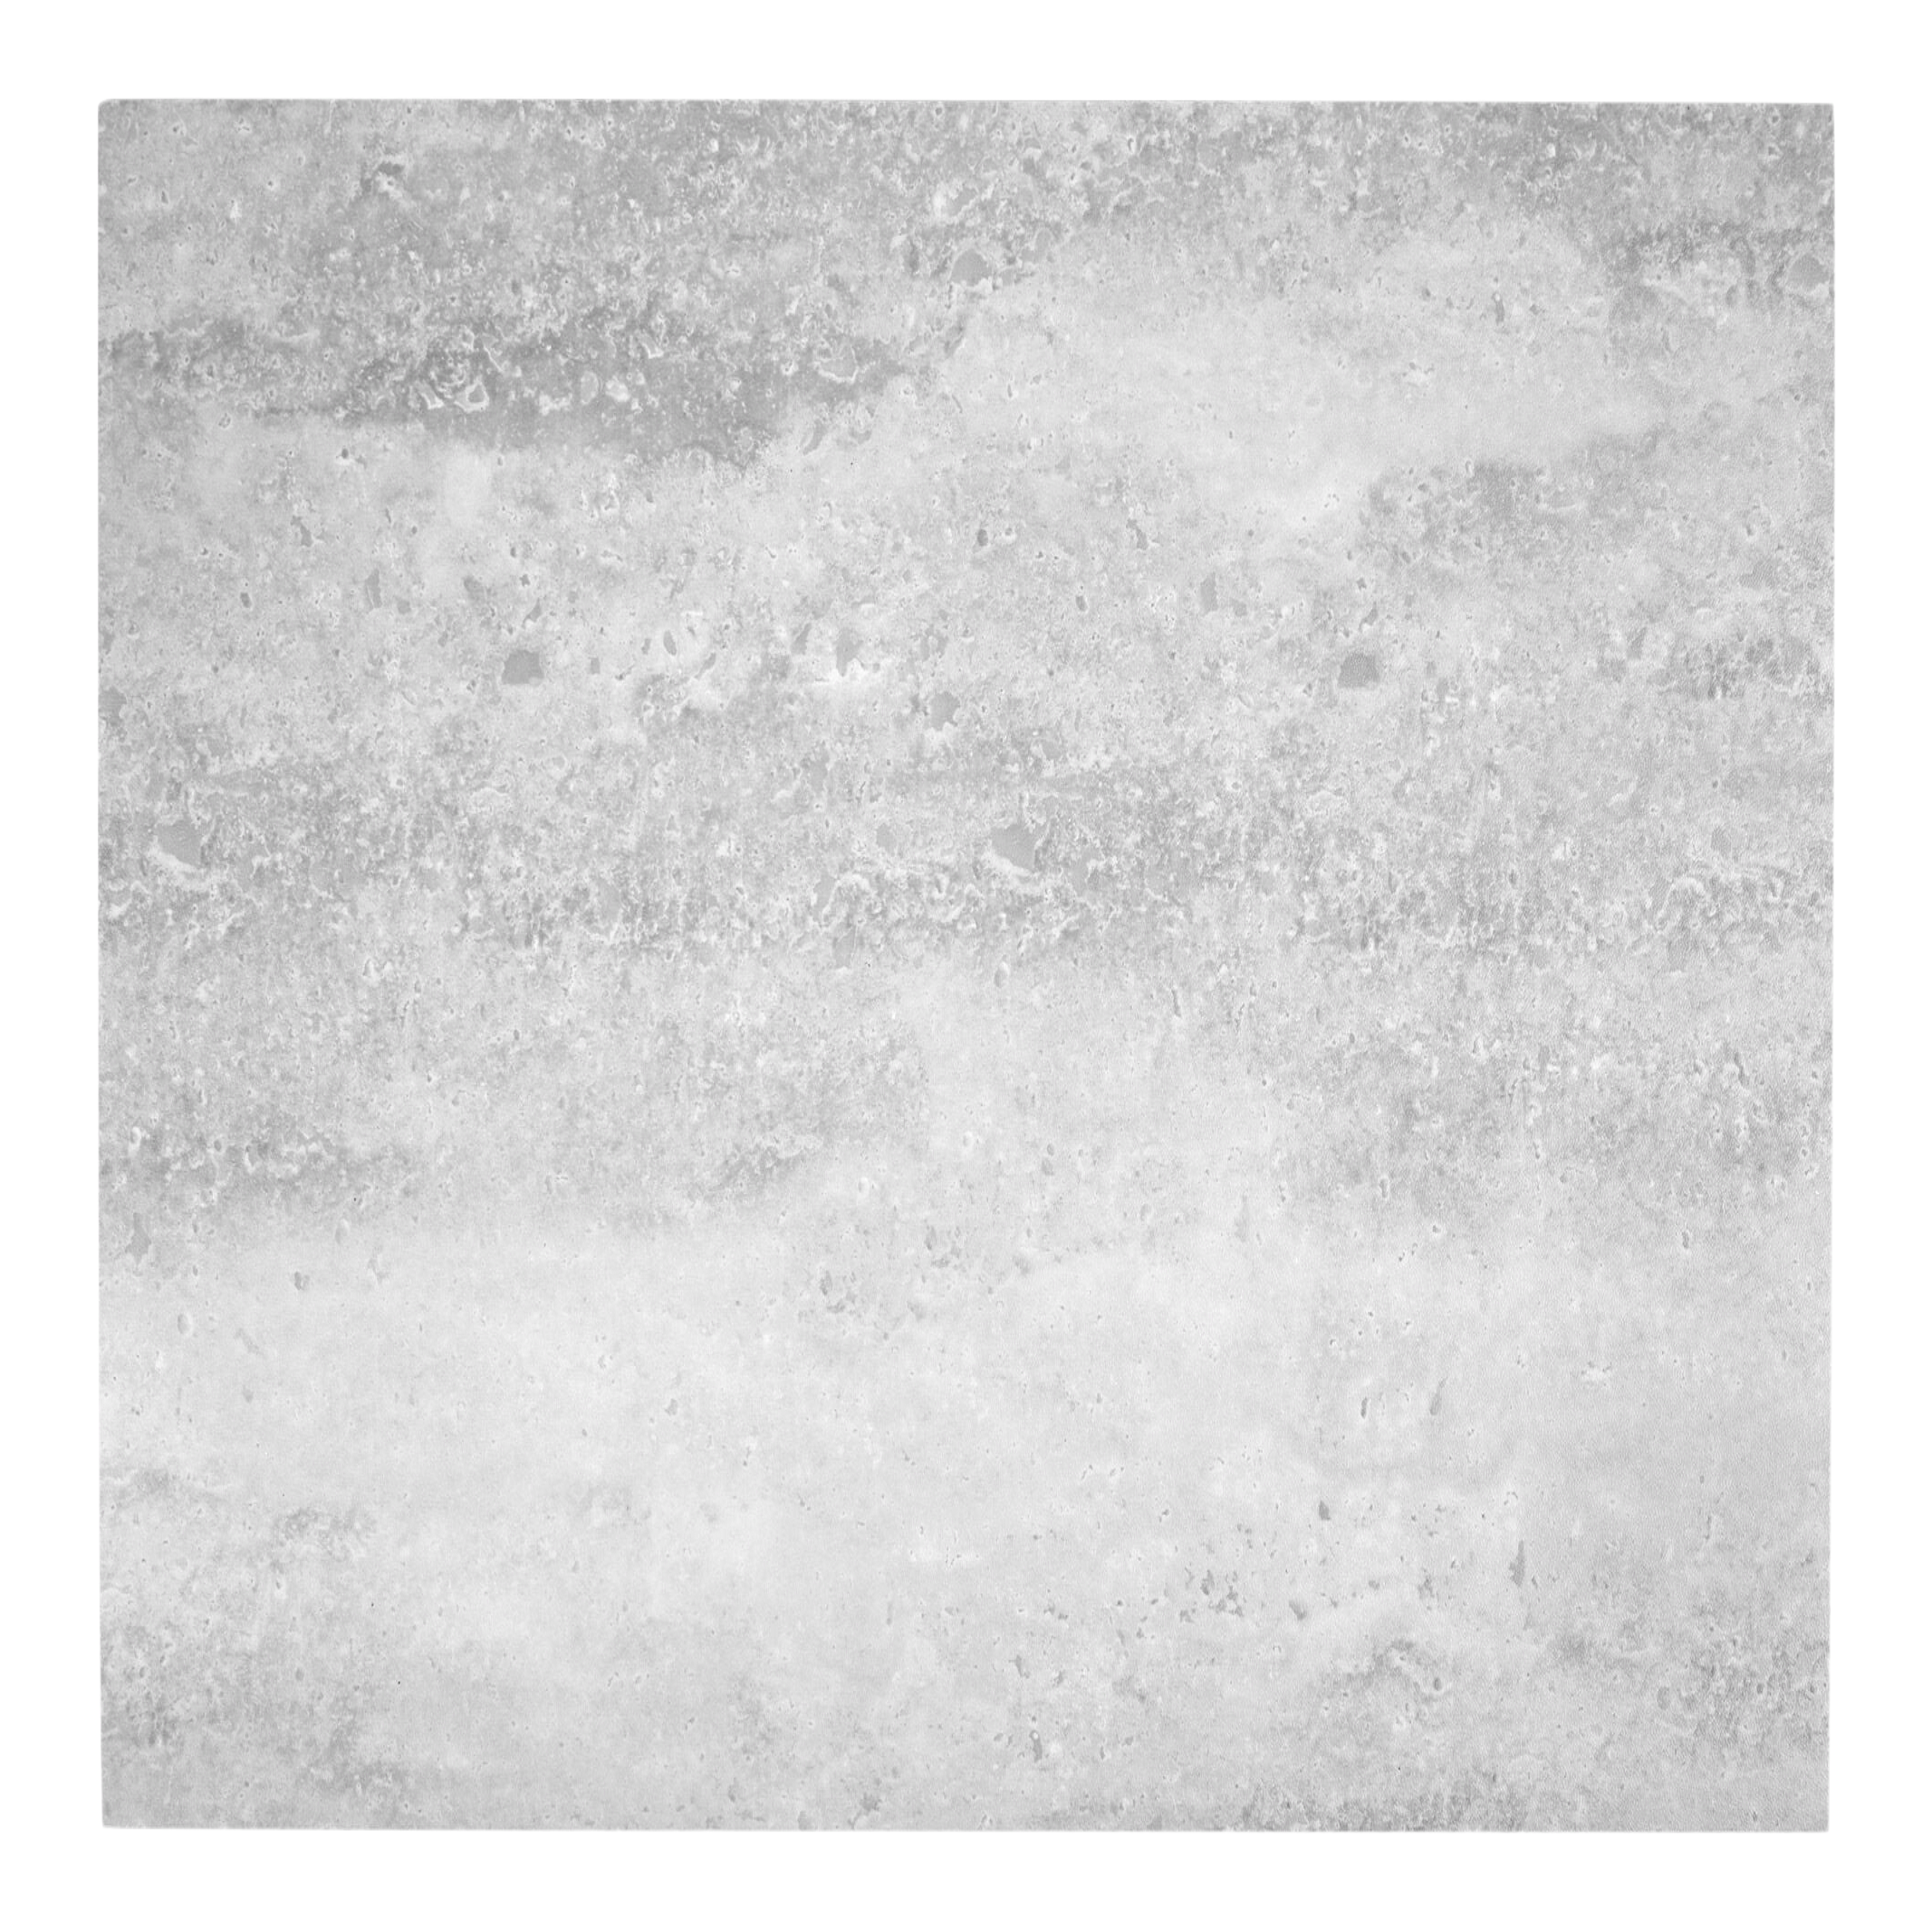 Cement Look PVC Placemat